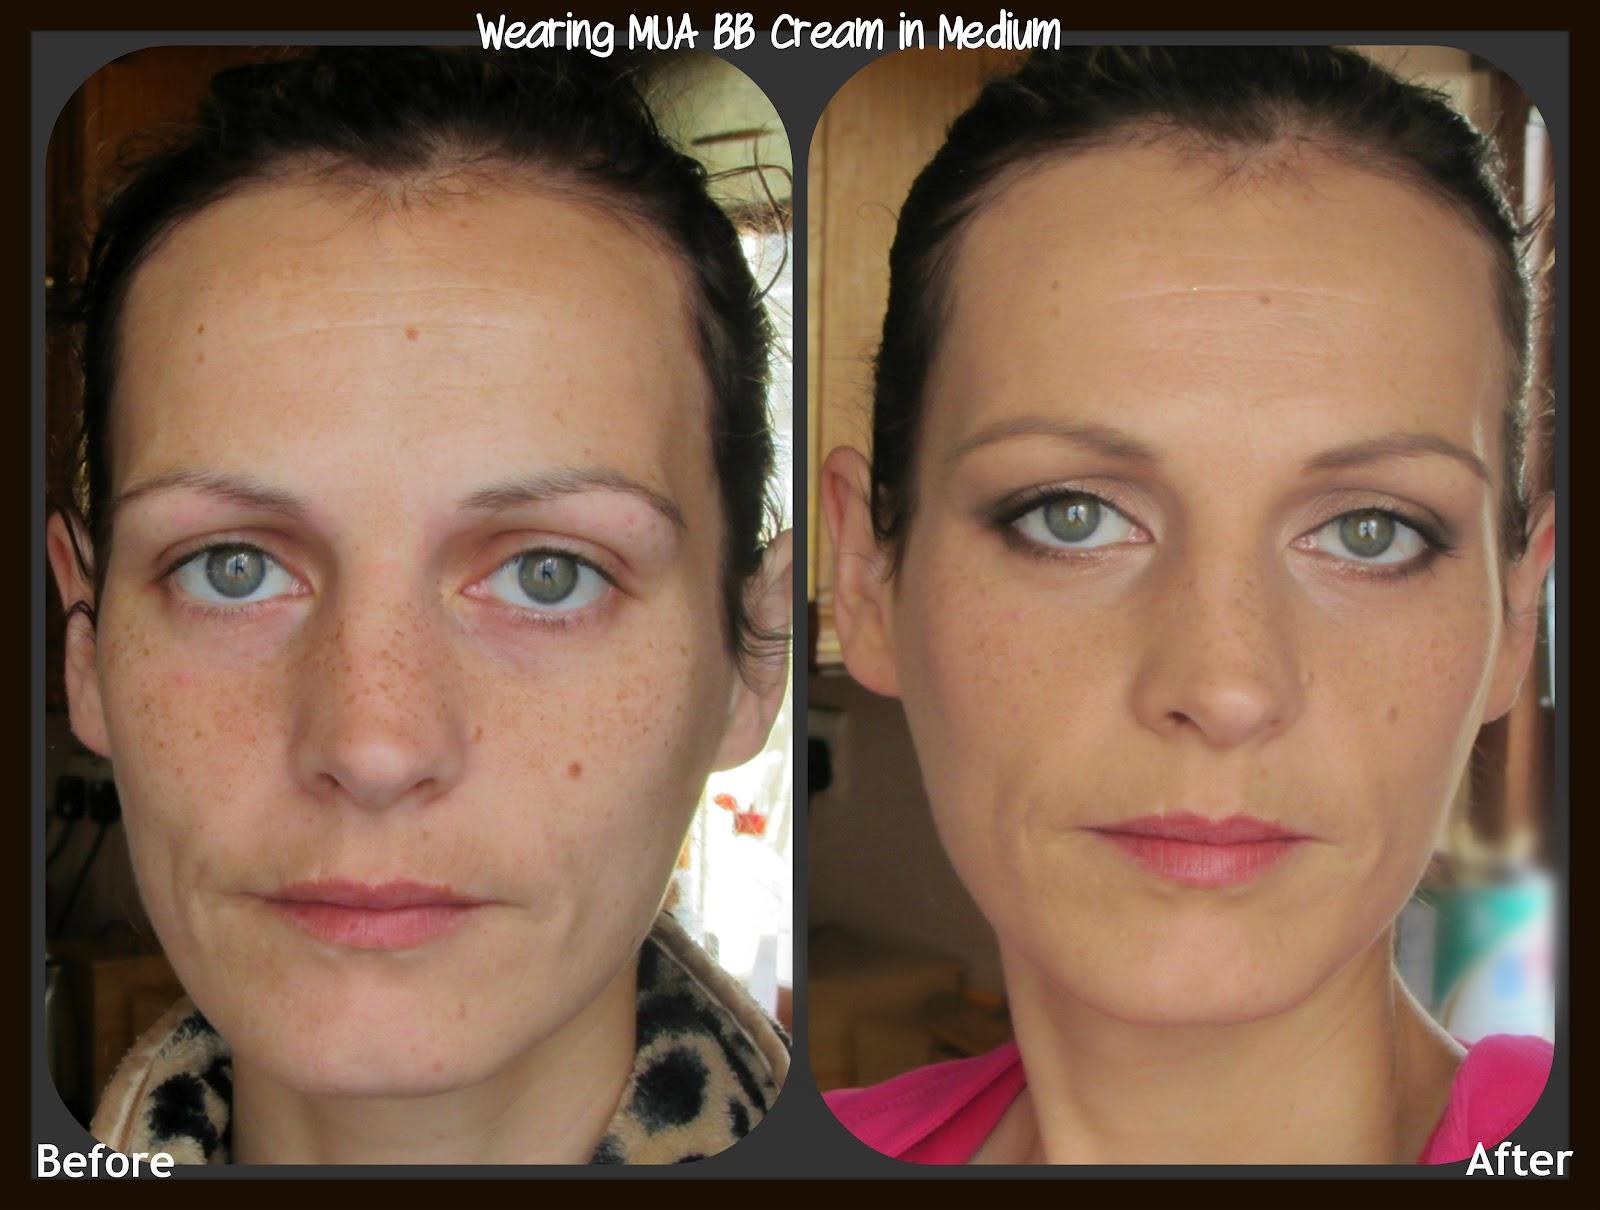 Makeup Stock Images  Download 1111462 Royalty Free Photos